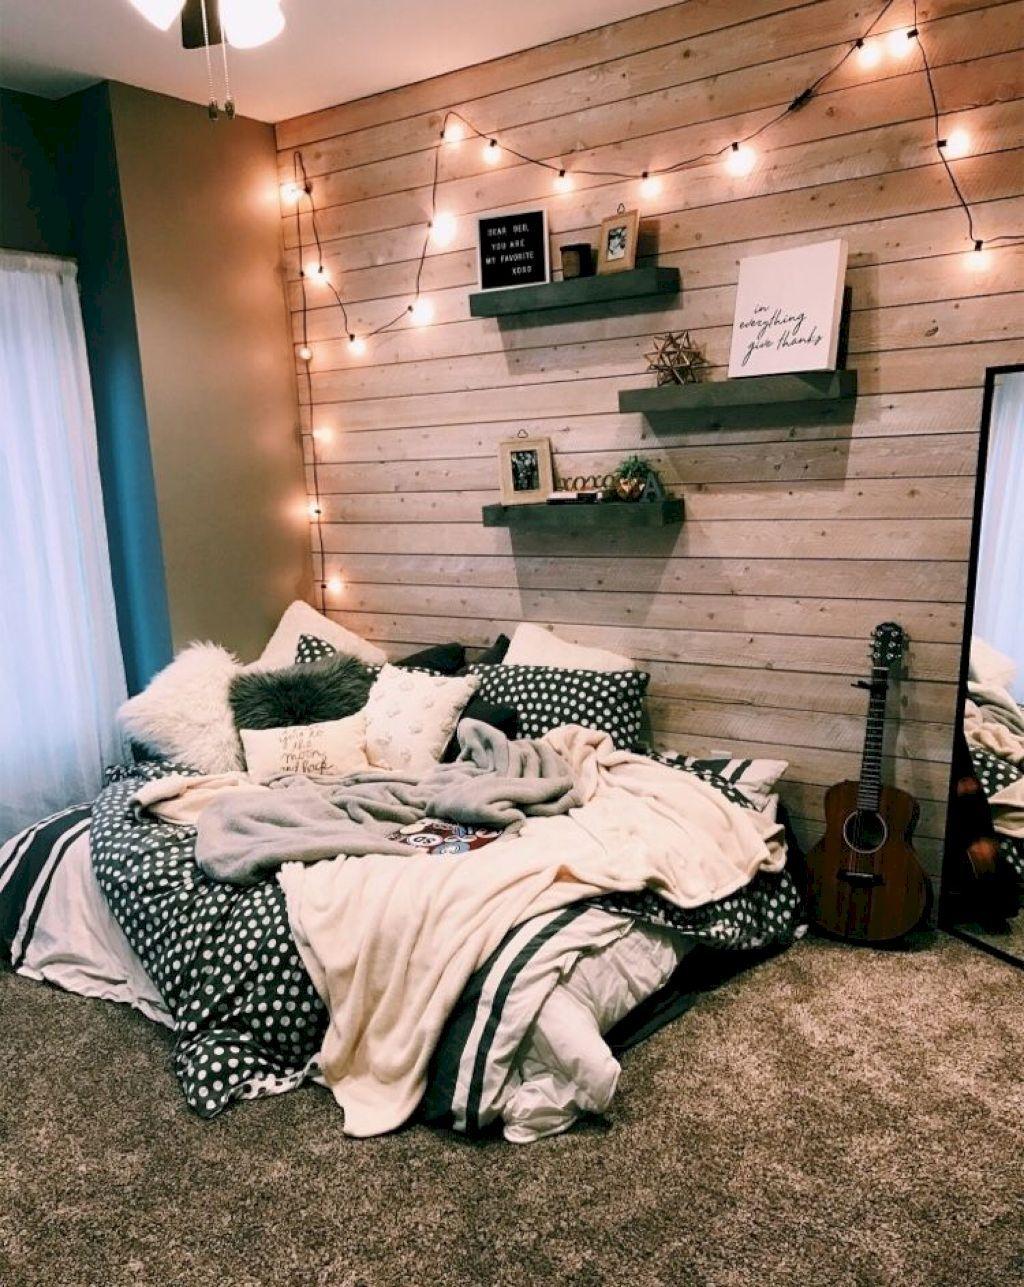 Adorable 91 Beautiful Comfy Bedroom Decorating Ideas https ... on Comfy Bedroom Ideas  id=47480